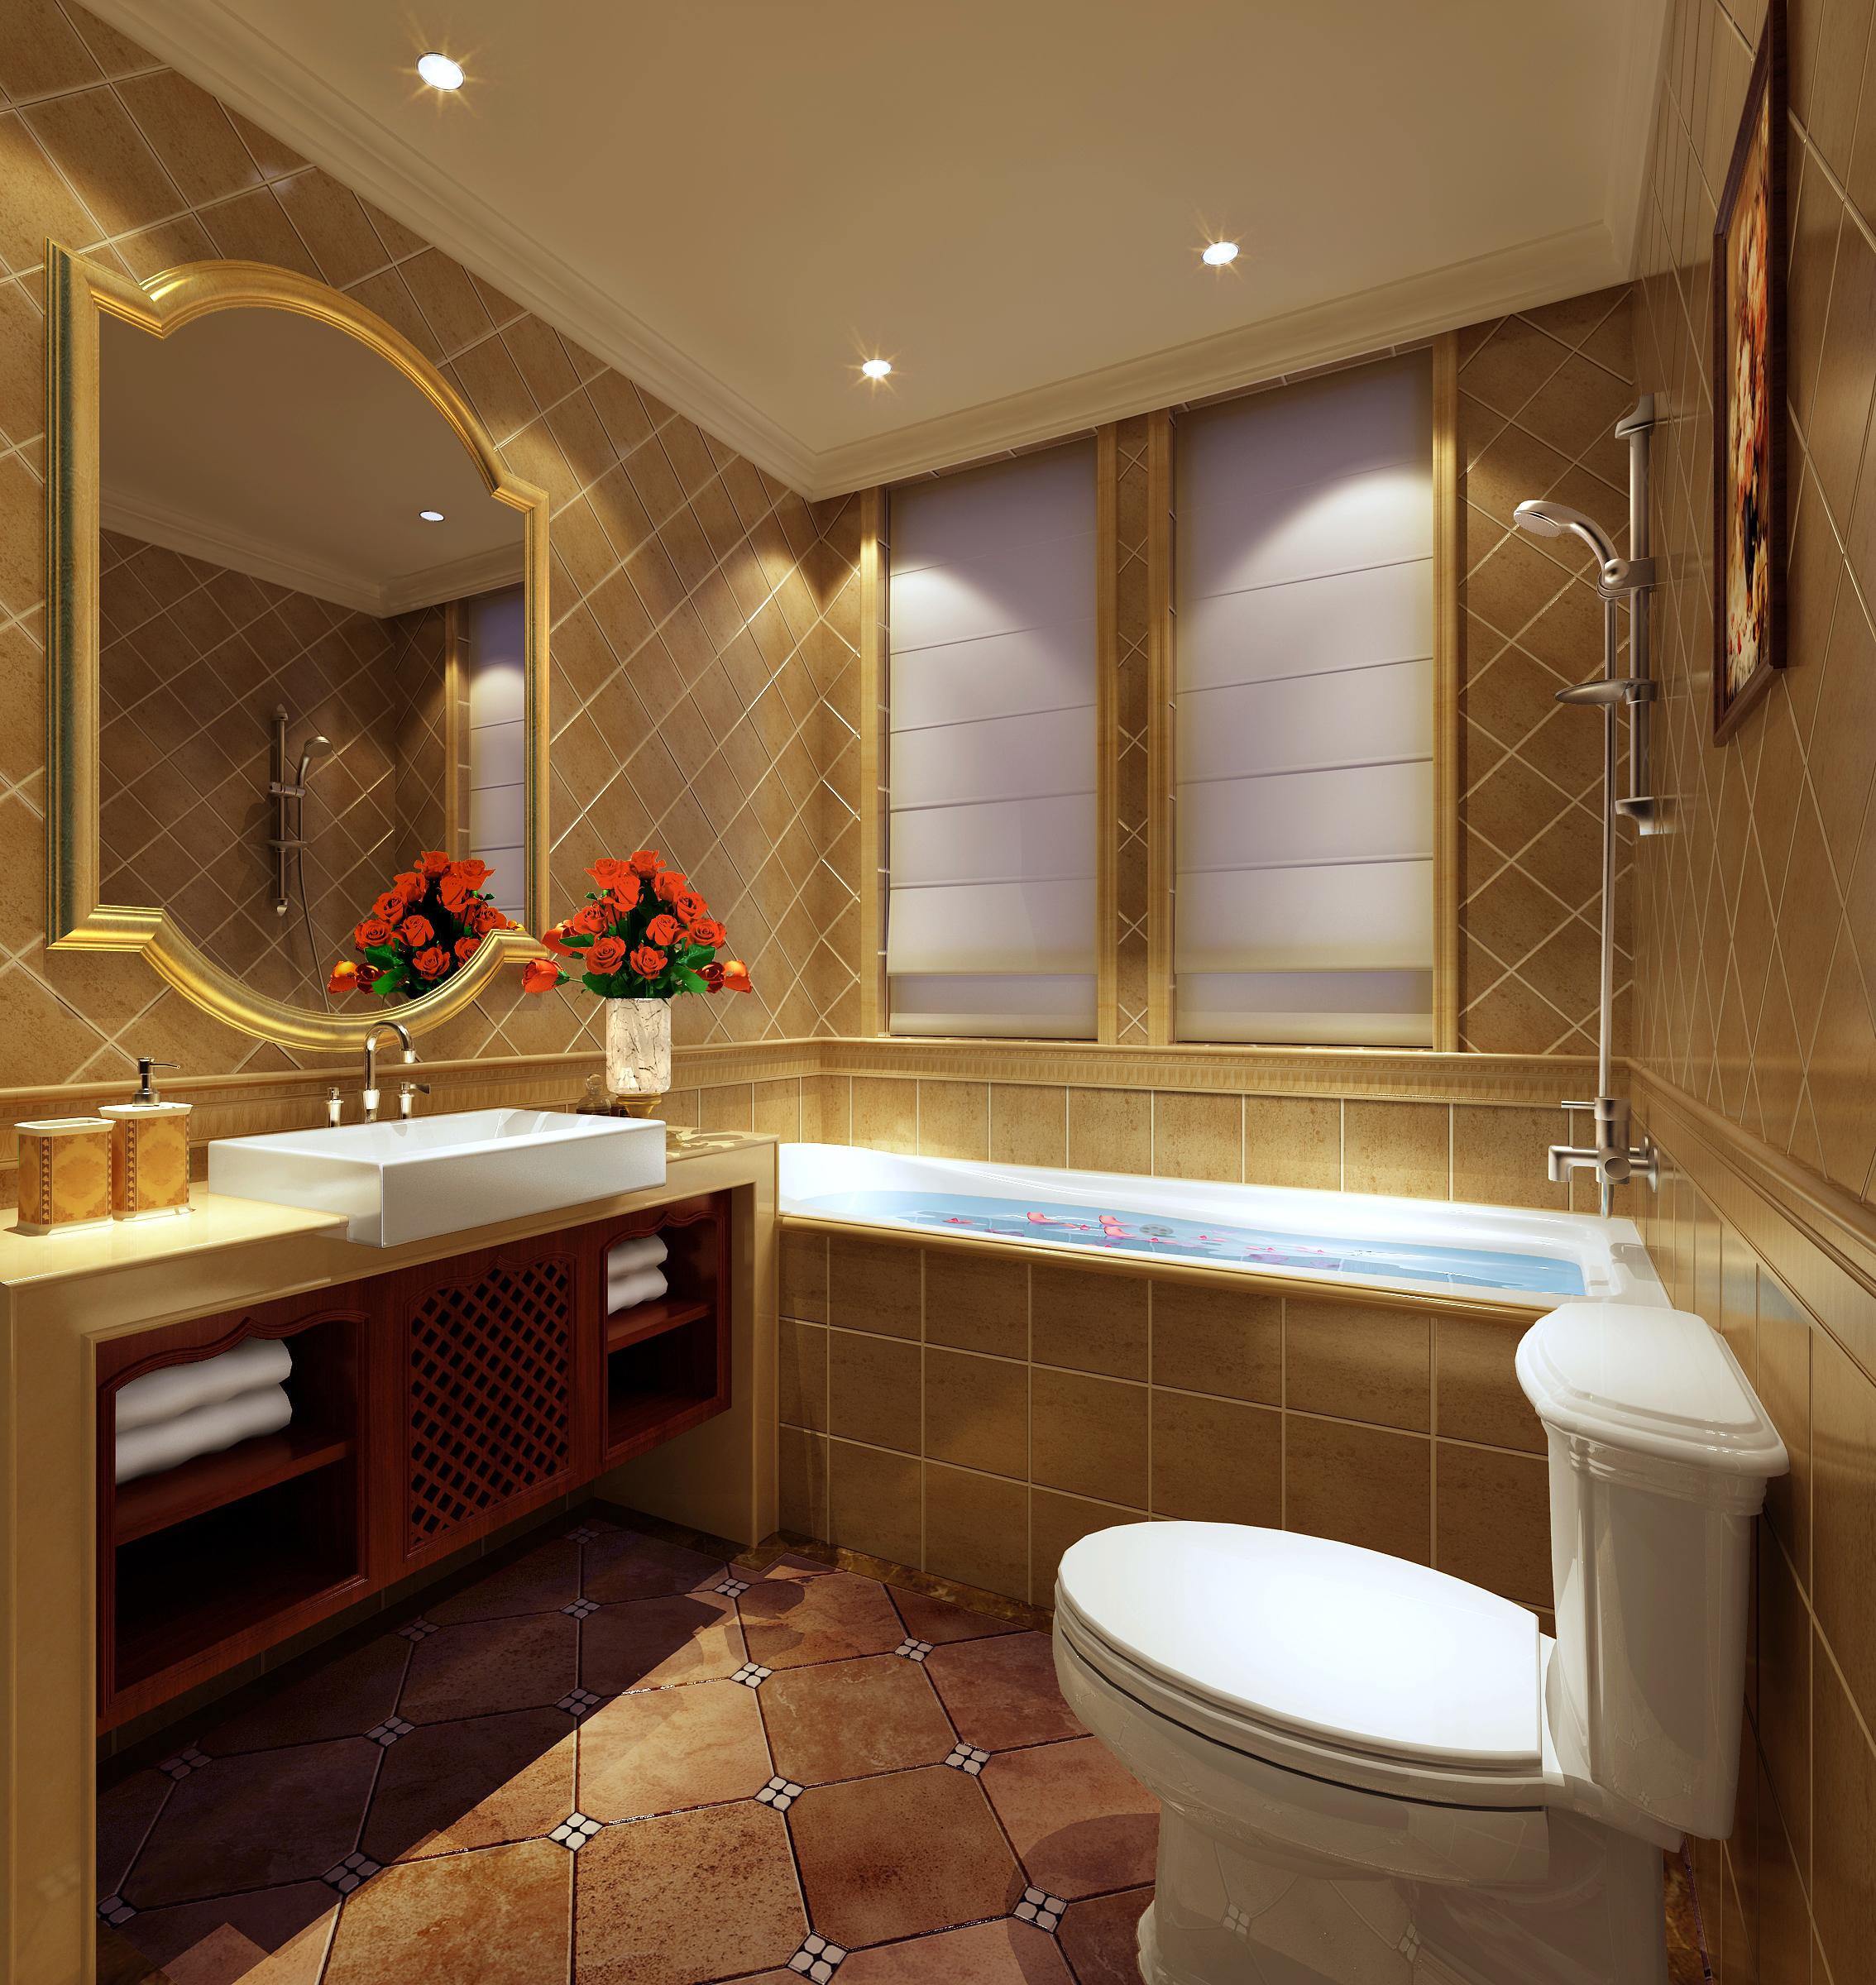 Classic Bathroom 3D Model .max - CGTrader.com on Model Bathroom  id=12444